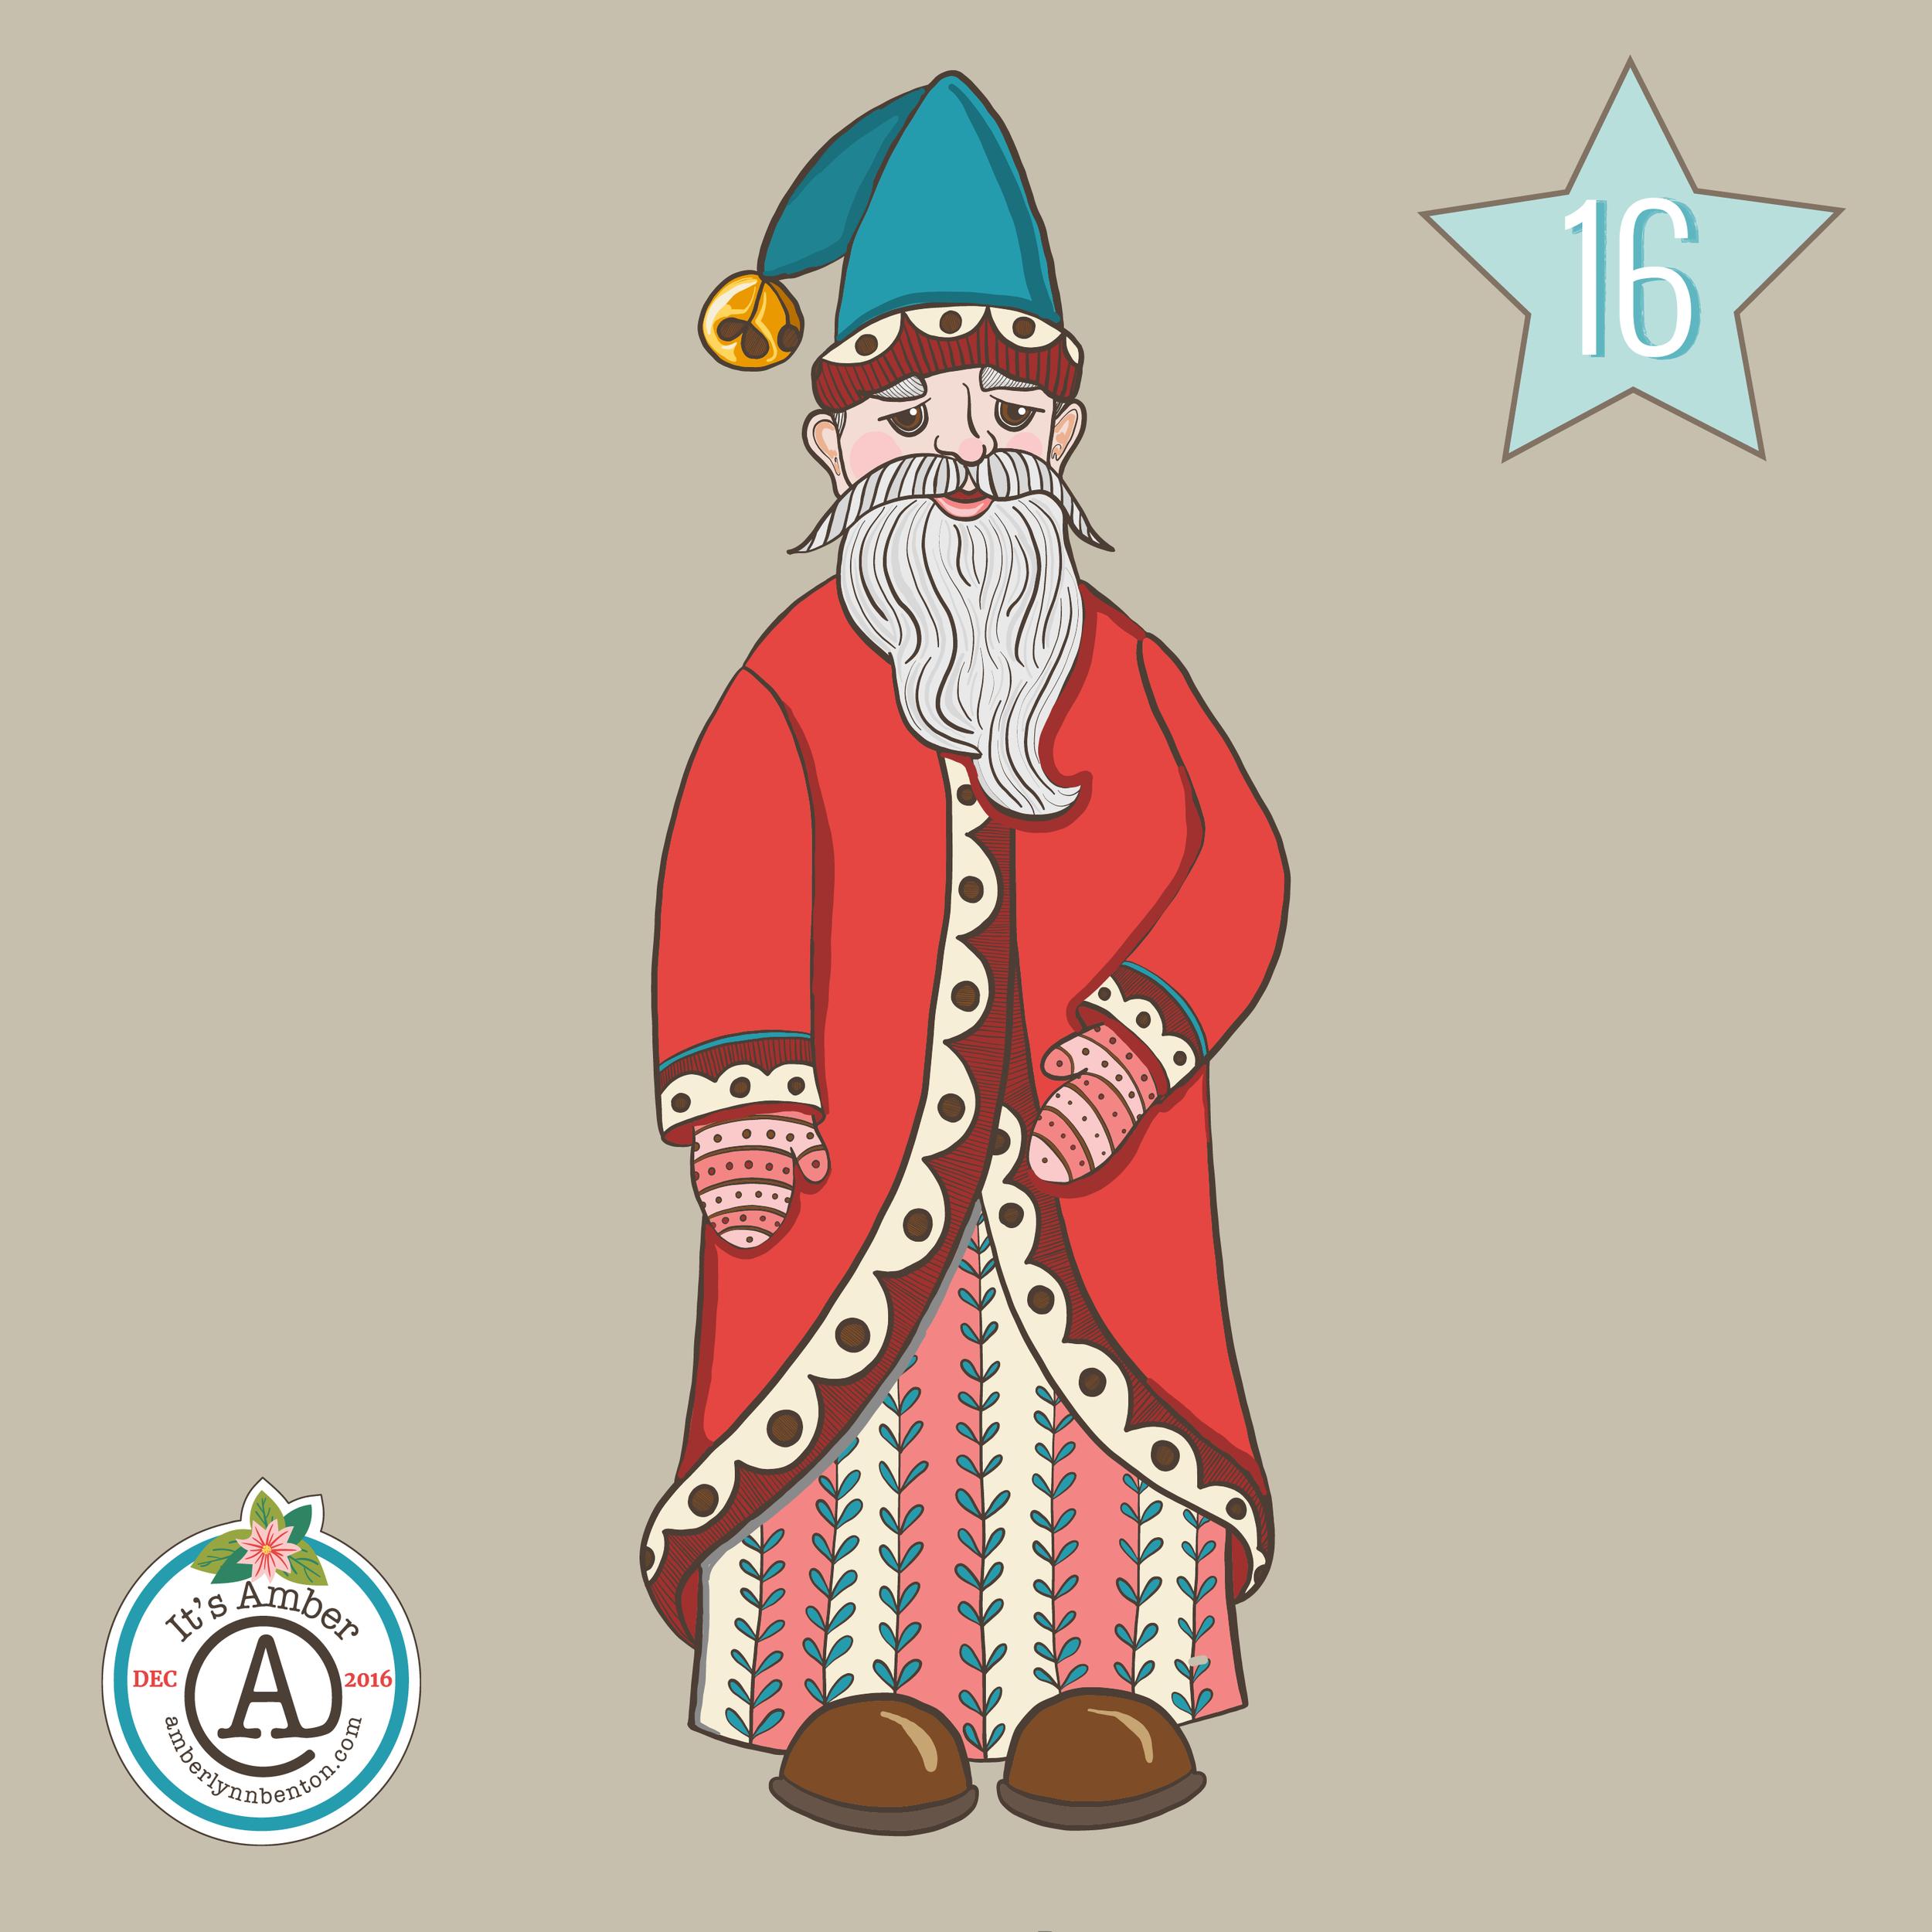 Santa Claus by Amber Lynn Benton for #ItsAdvent2016